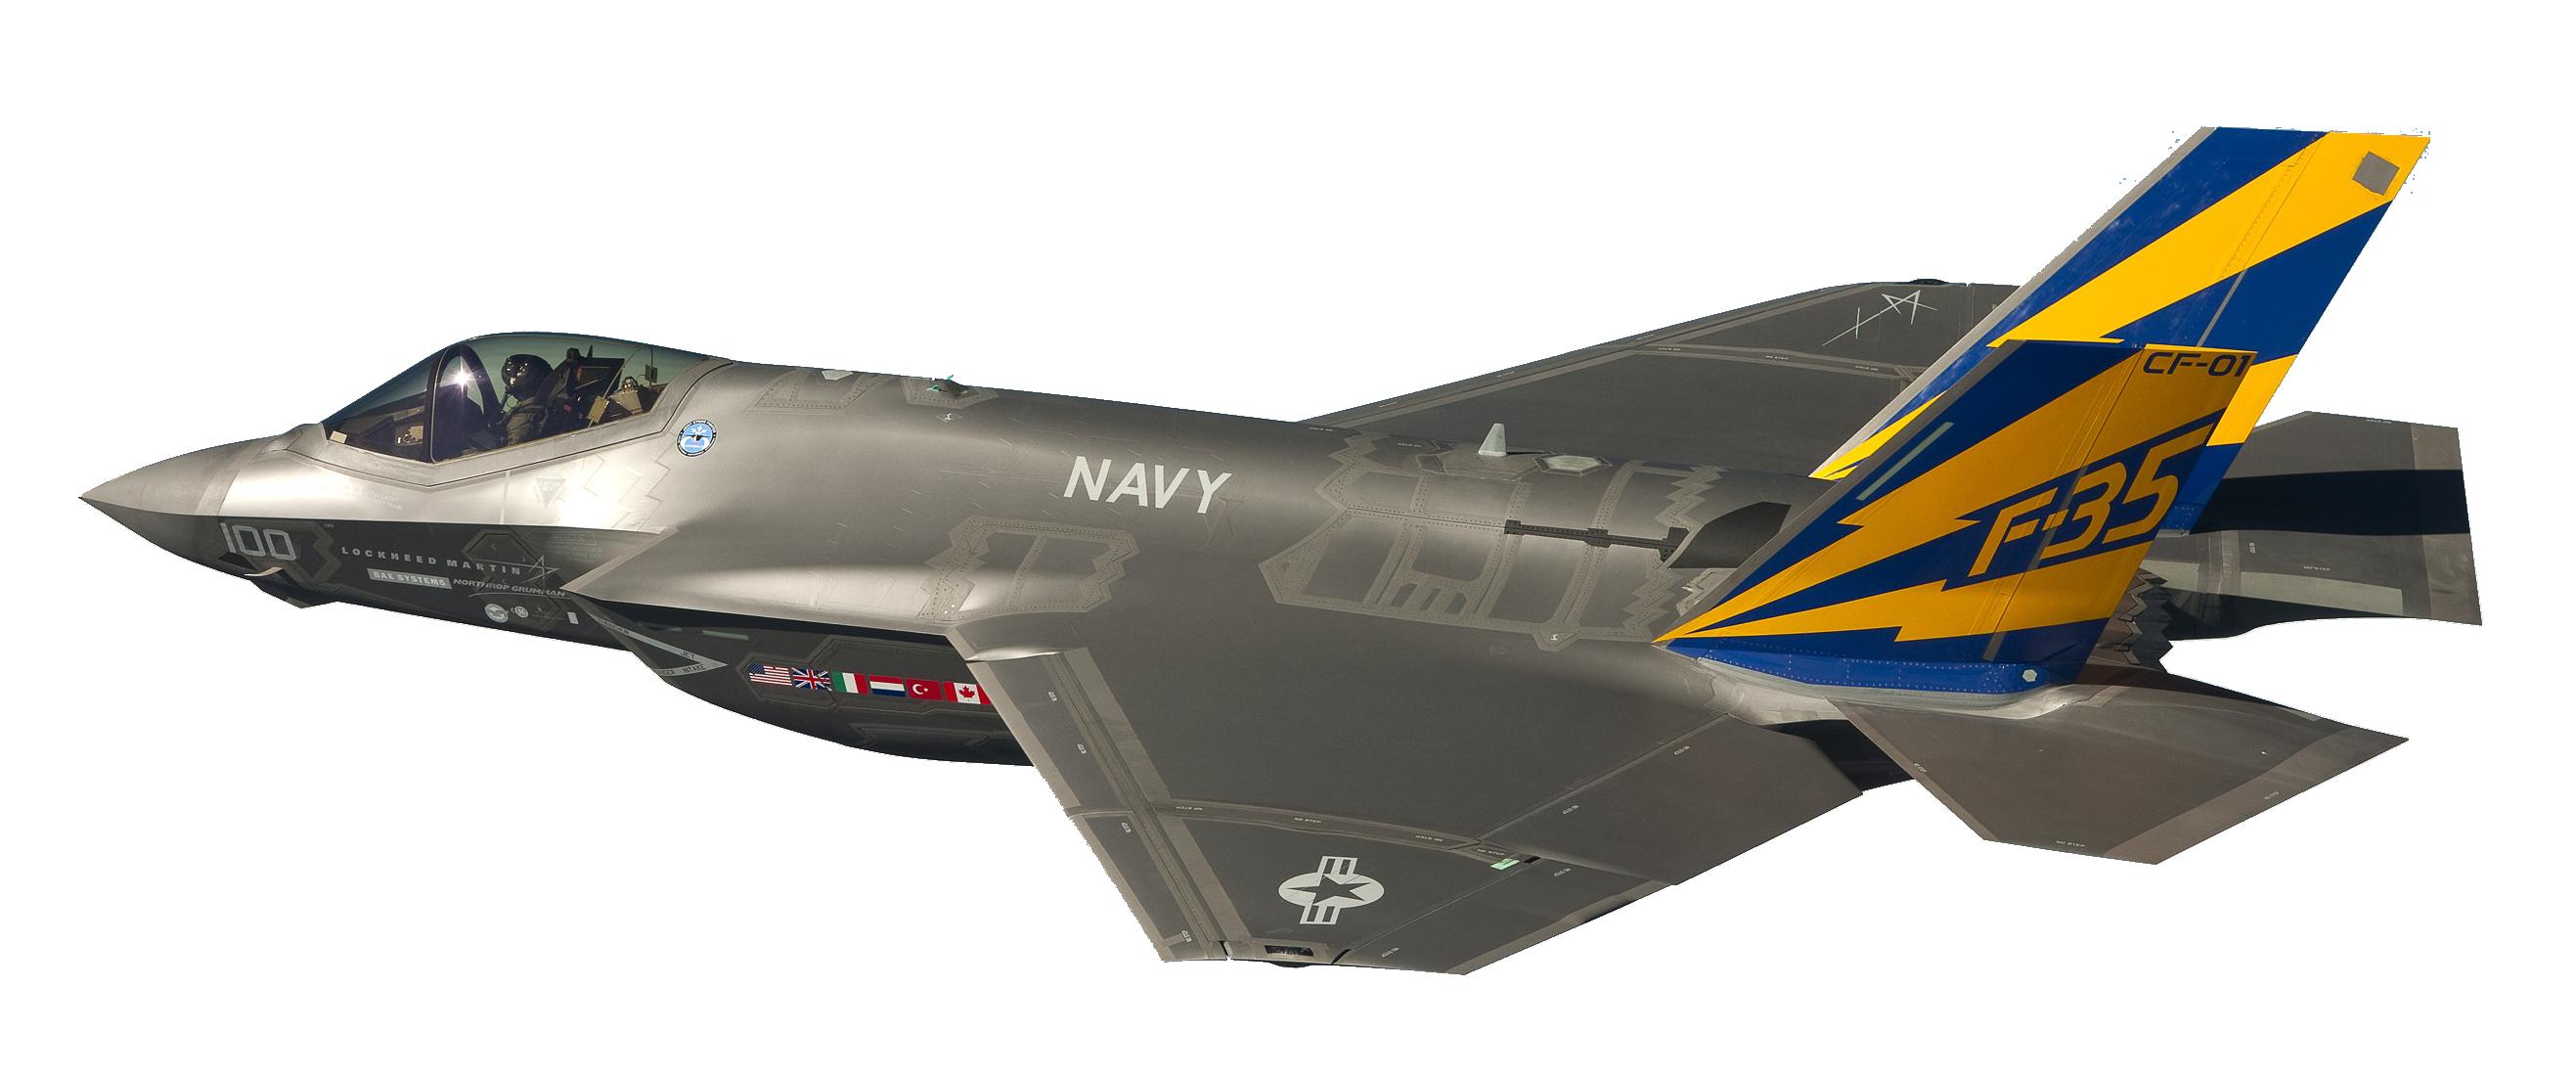 Fighter png transparent image. Jet clipart military jet